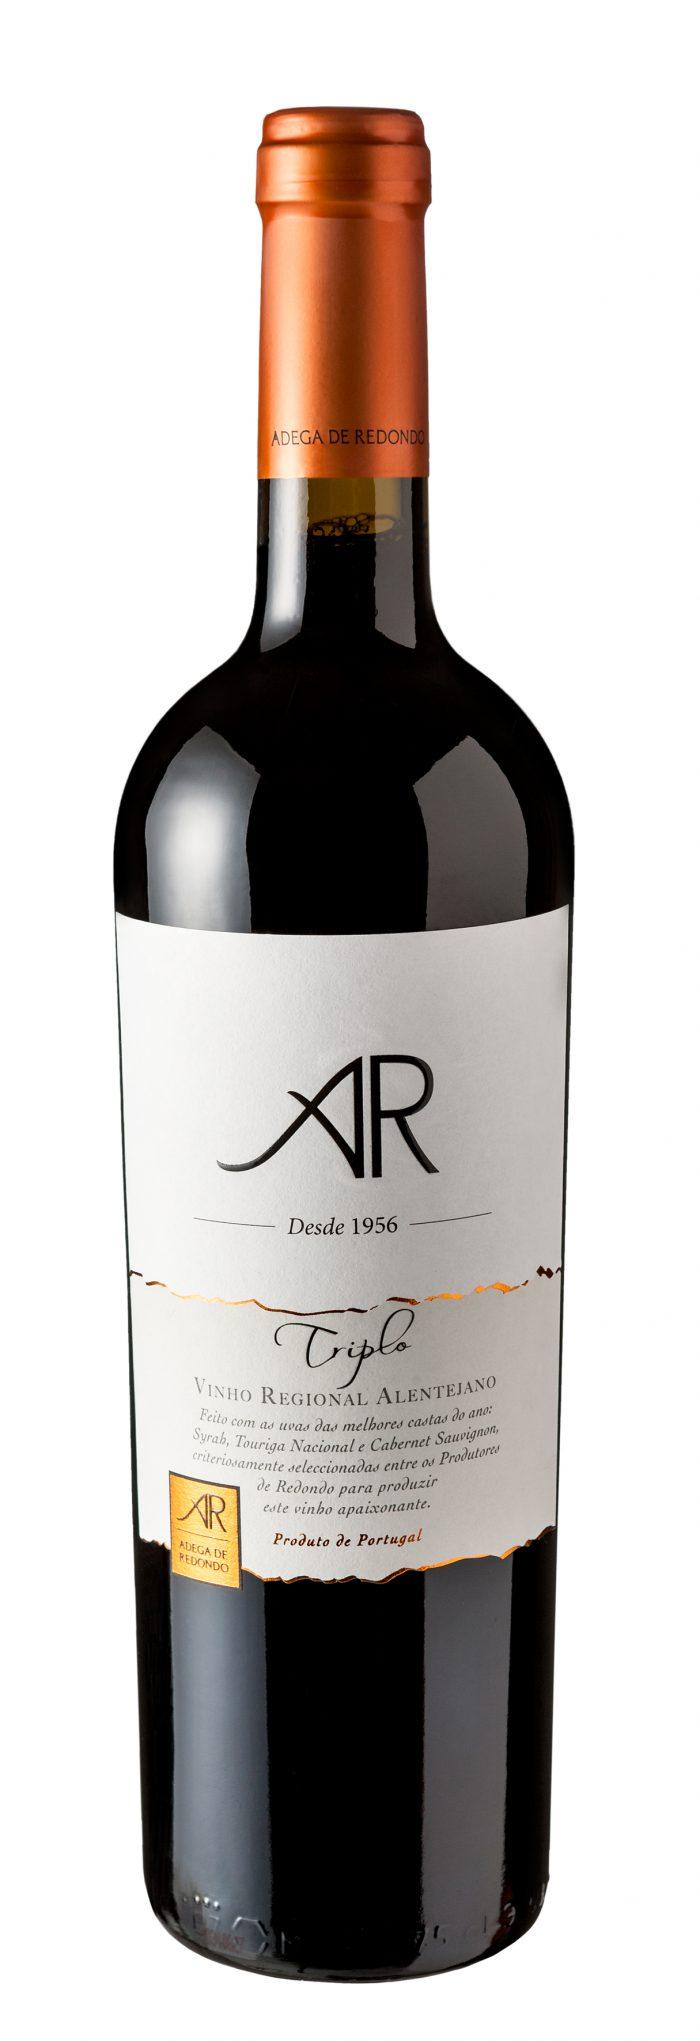 AR Triplo | Portugal | gemaakt van de druif: Cabernet Sauvignon, Shiraz, Touriga Nacional